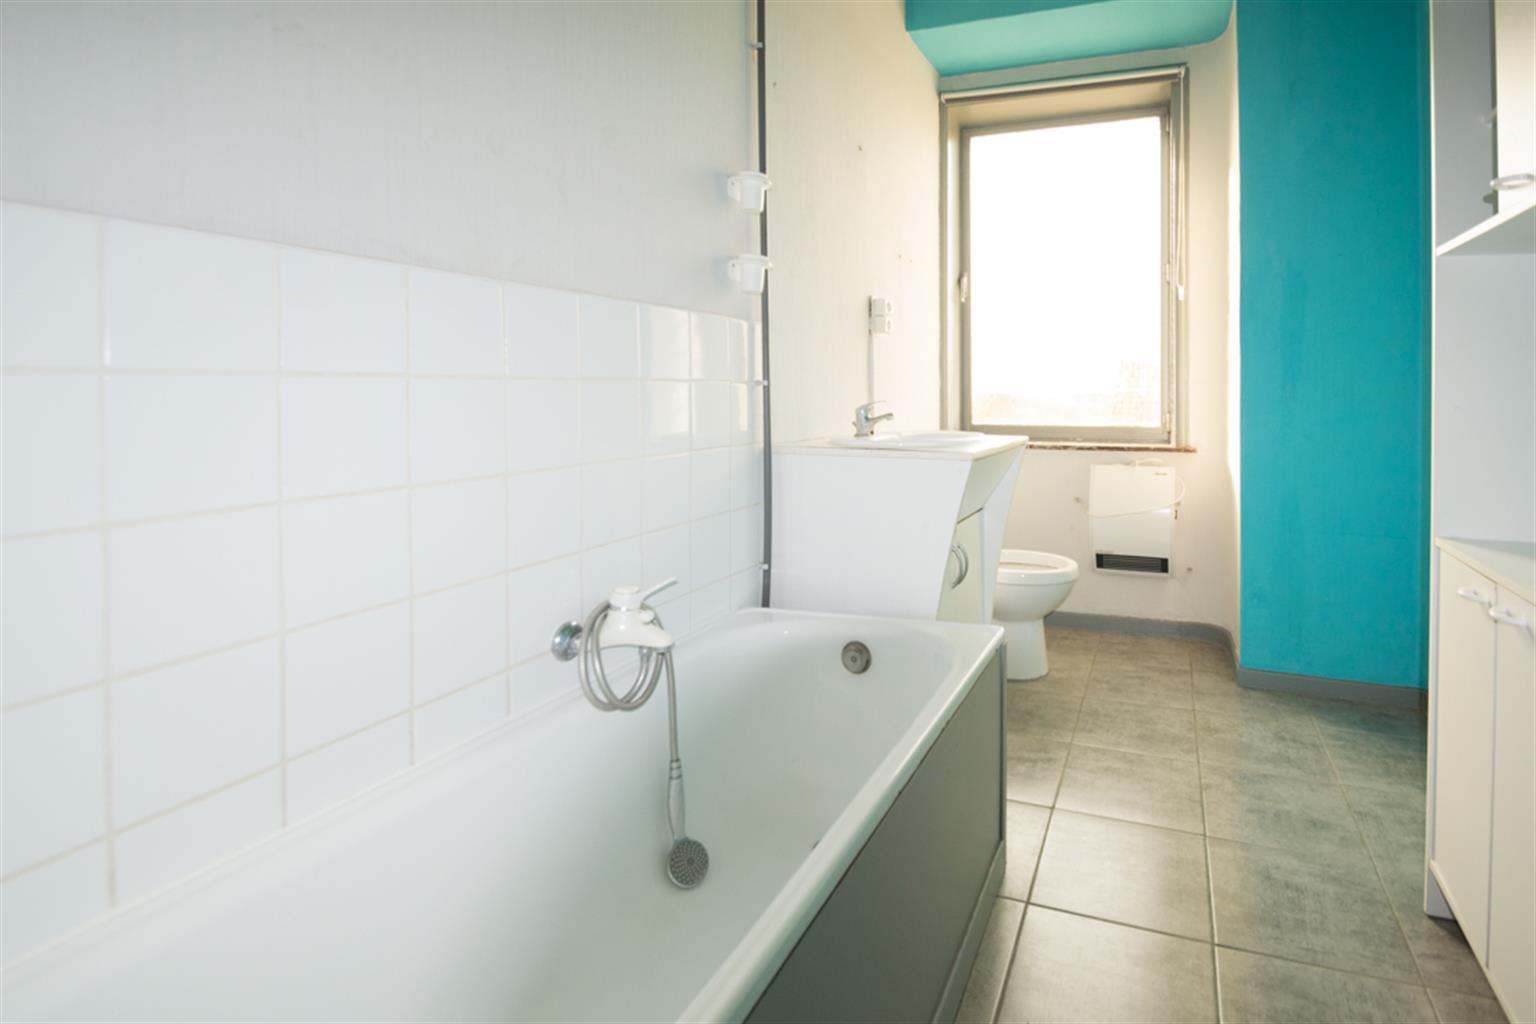 Maison - Houdeng-Aimeries - #4295574-10